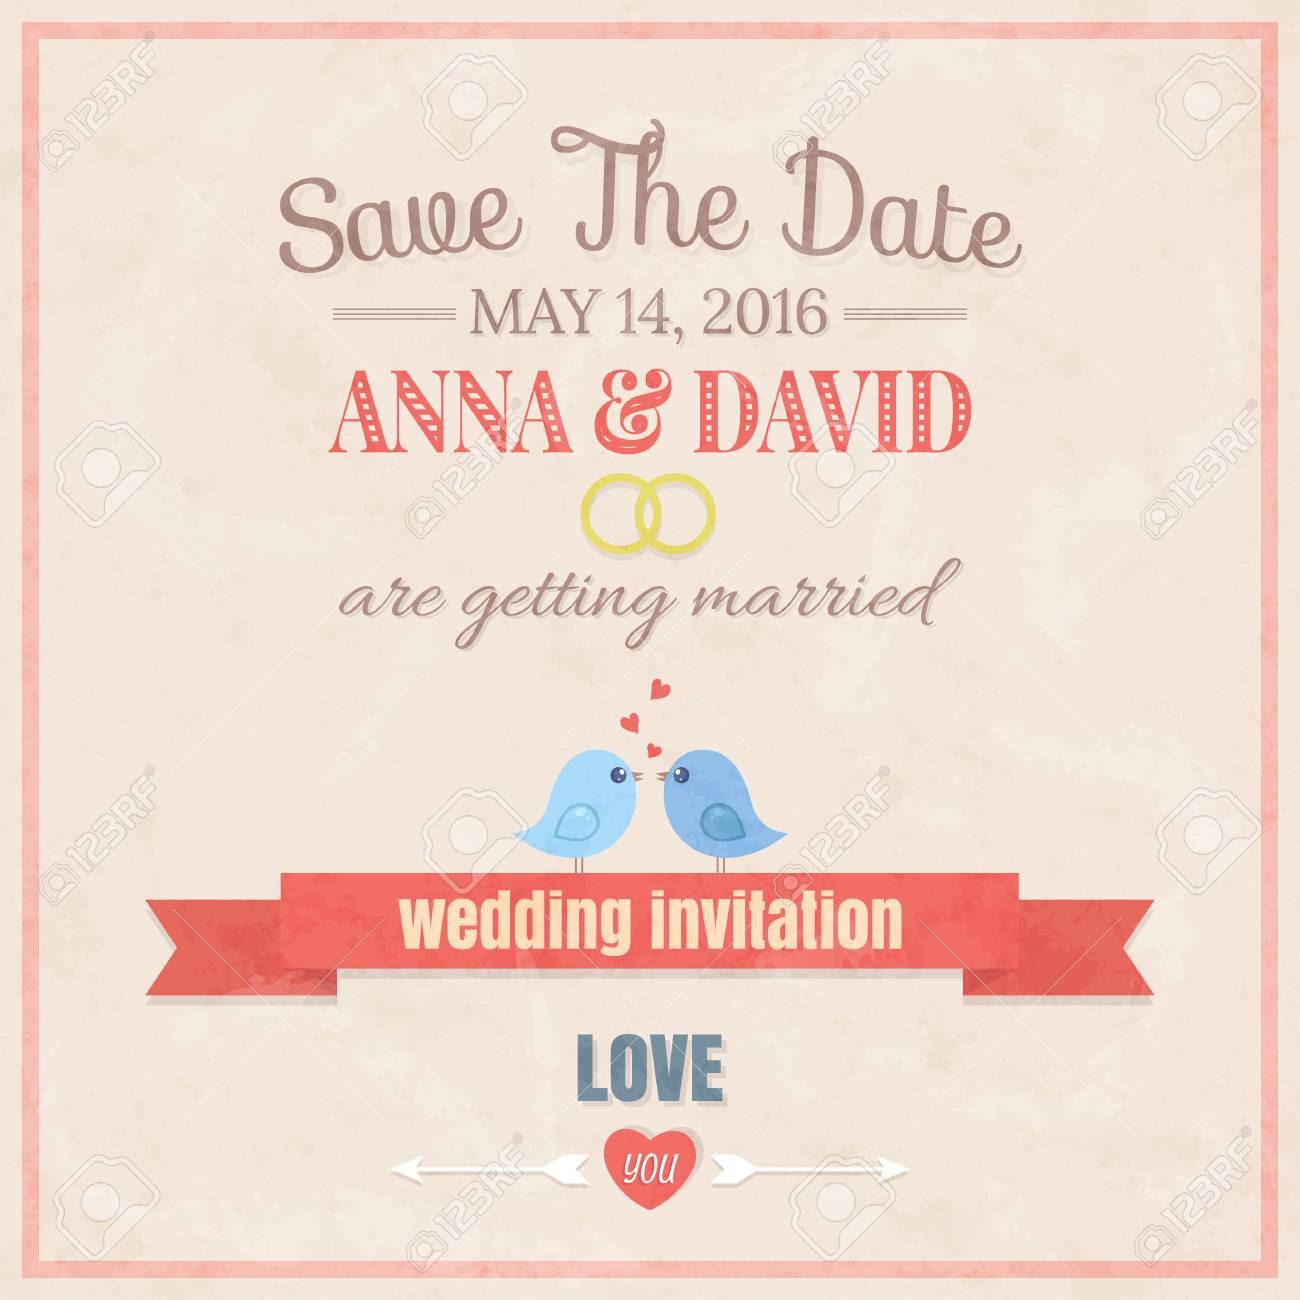 Cute Wedding Invitation Card , Vector Illustration Royalty Free ...